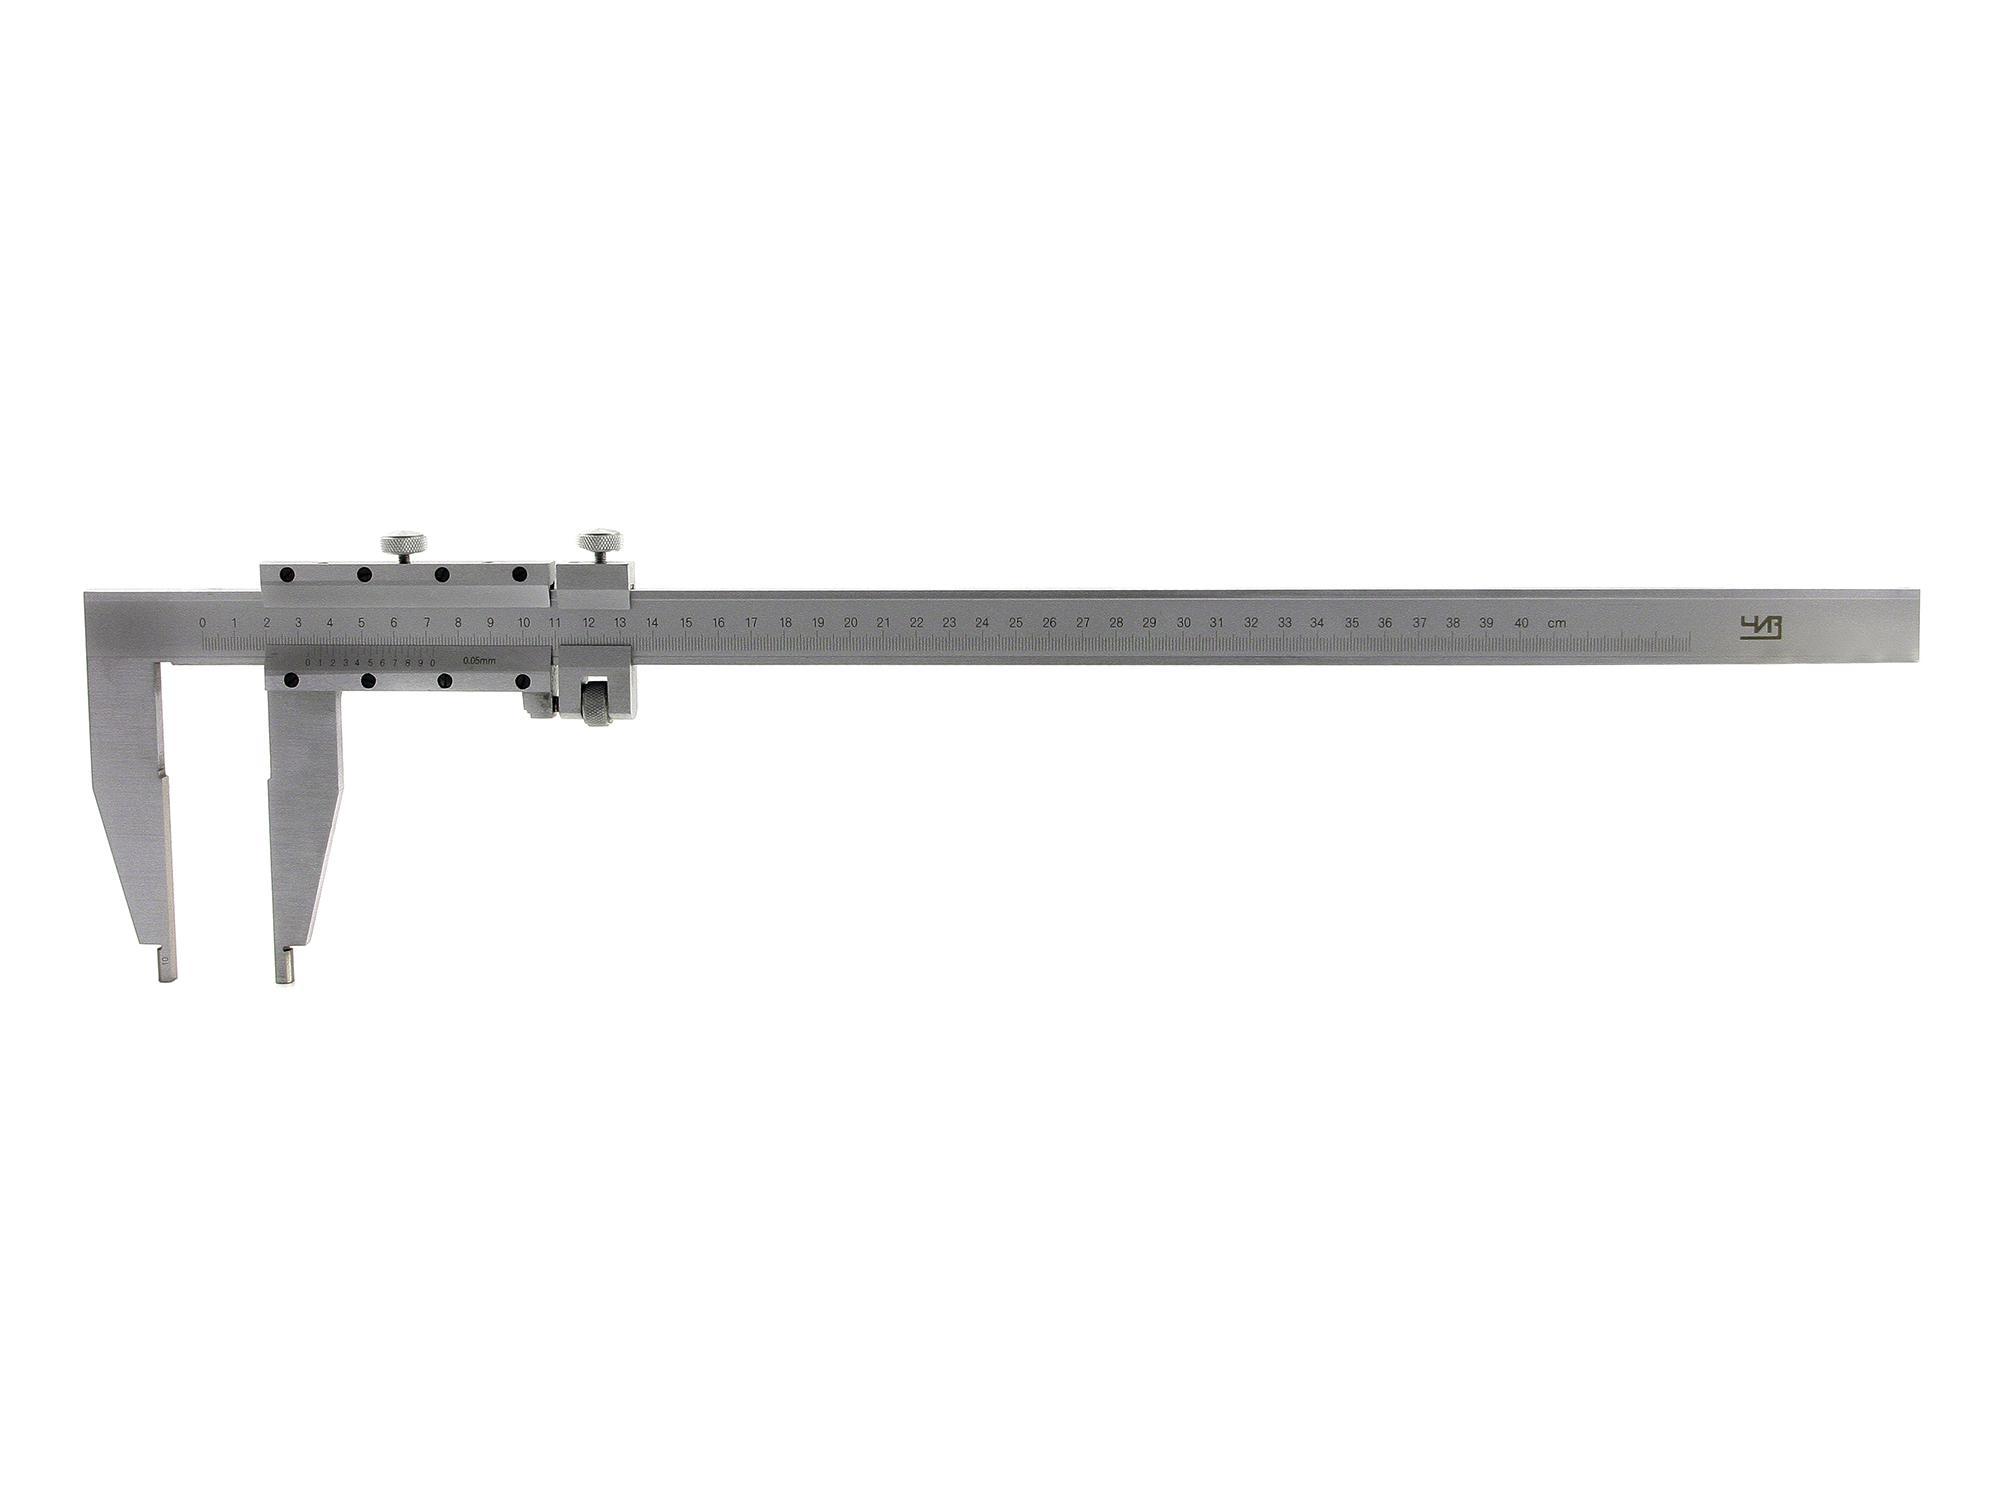 Штангенциркуль ЧИЗ ШЦ-3- 500 0.05 губ.150мм душевой трап pestan square 3 150 мм 13000007